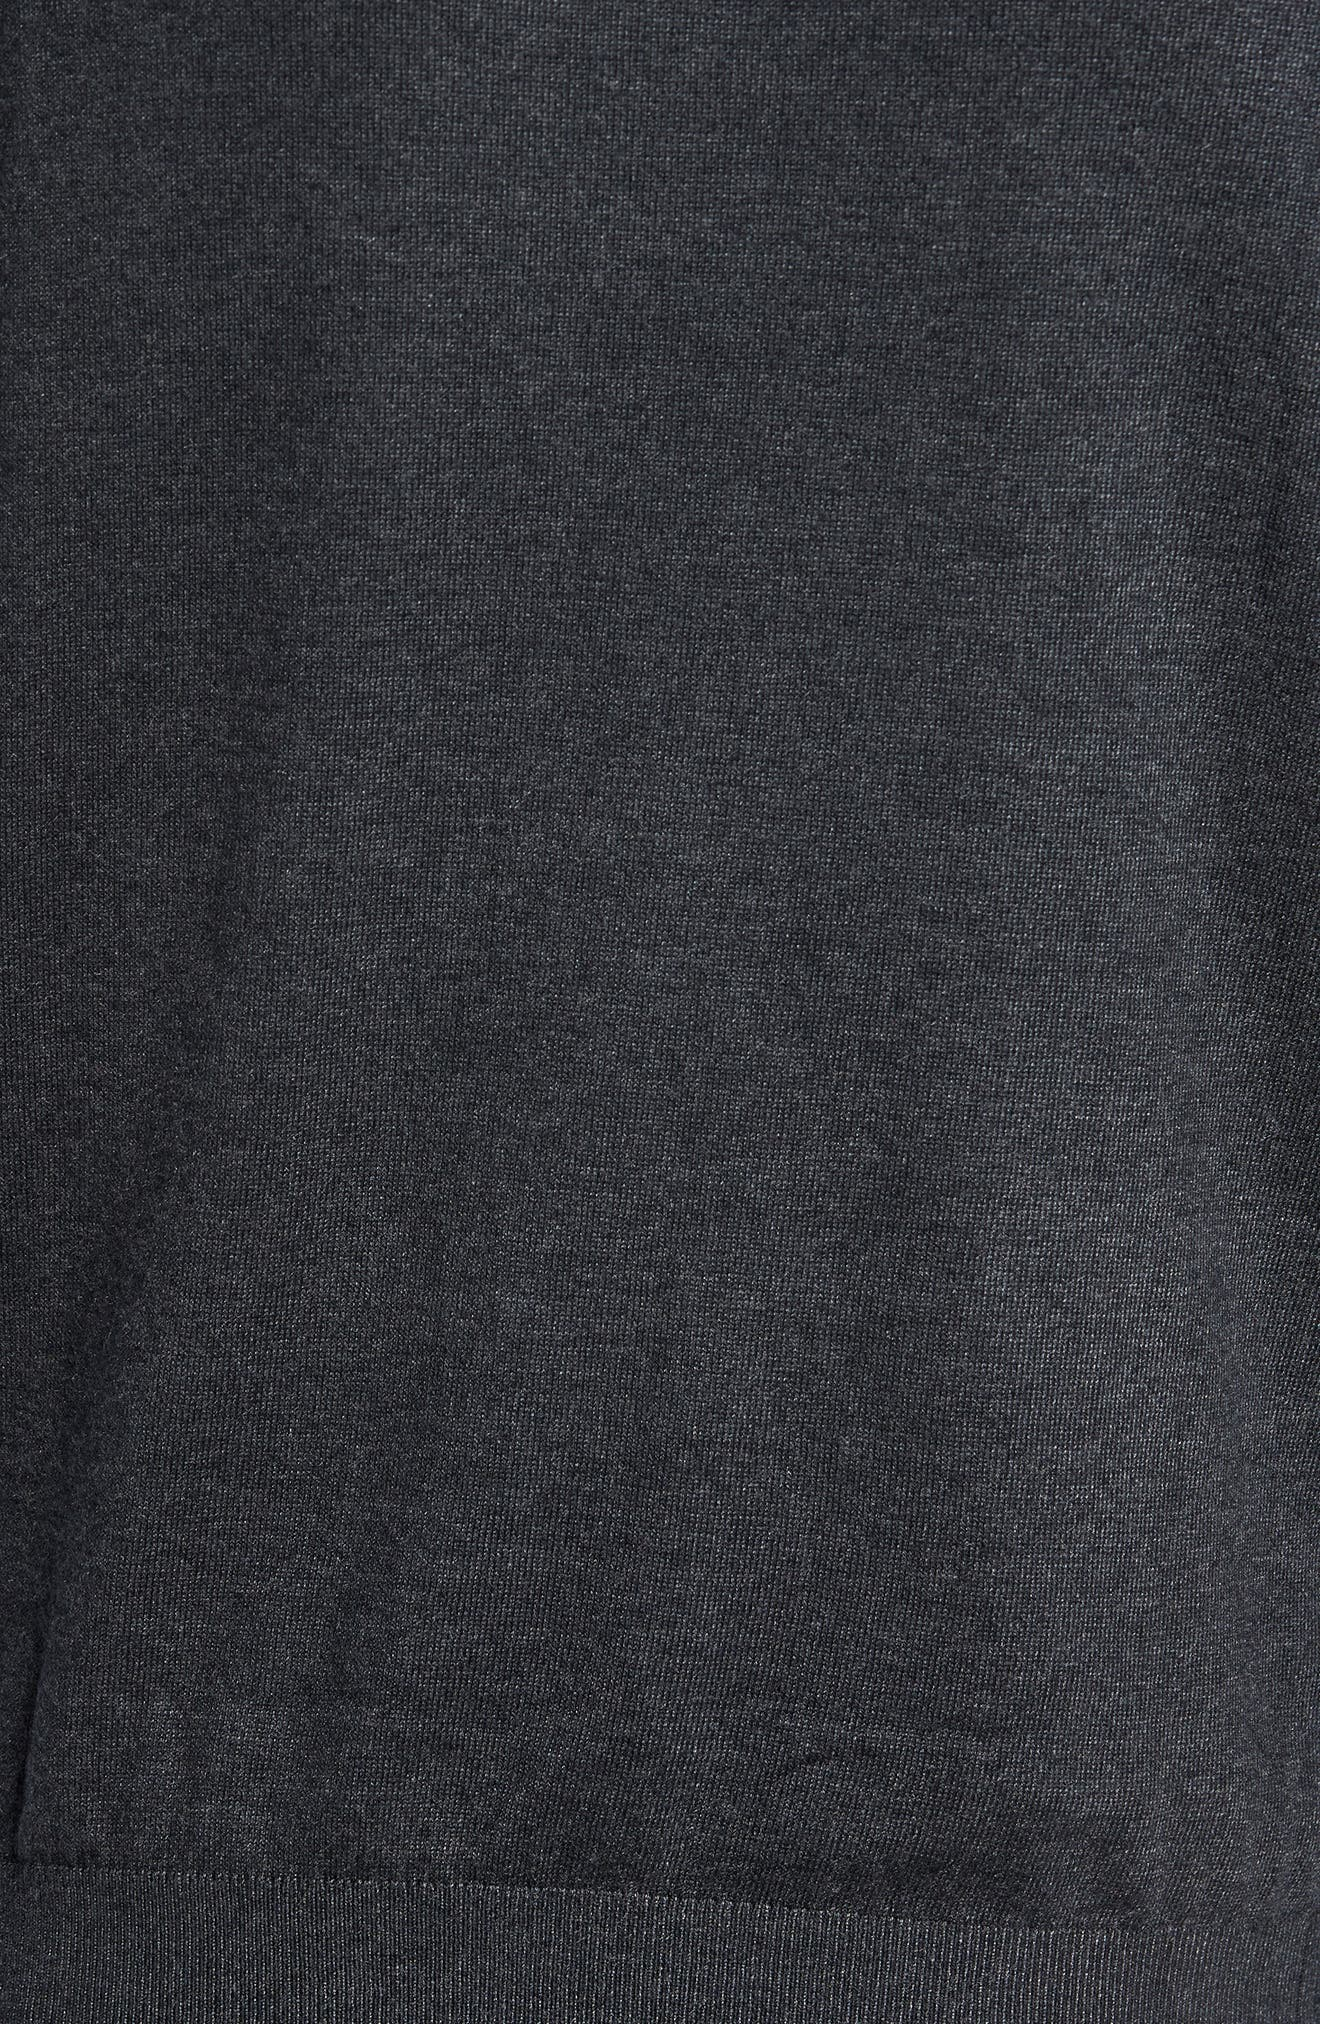 Pepmint Herringbone Sleeve Sweatshirt,                             Alternate thumbnail 9, color,